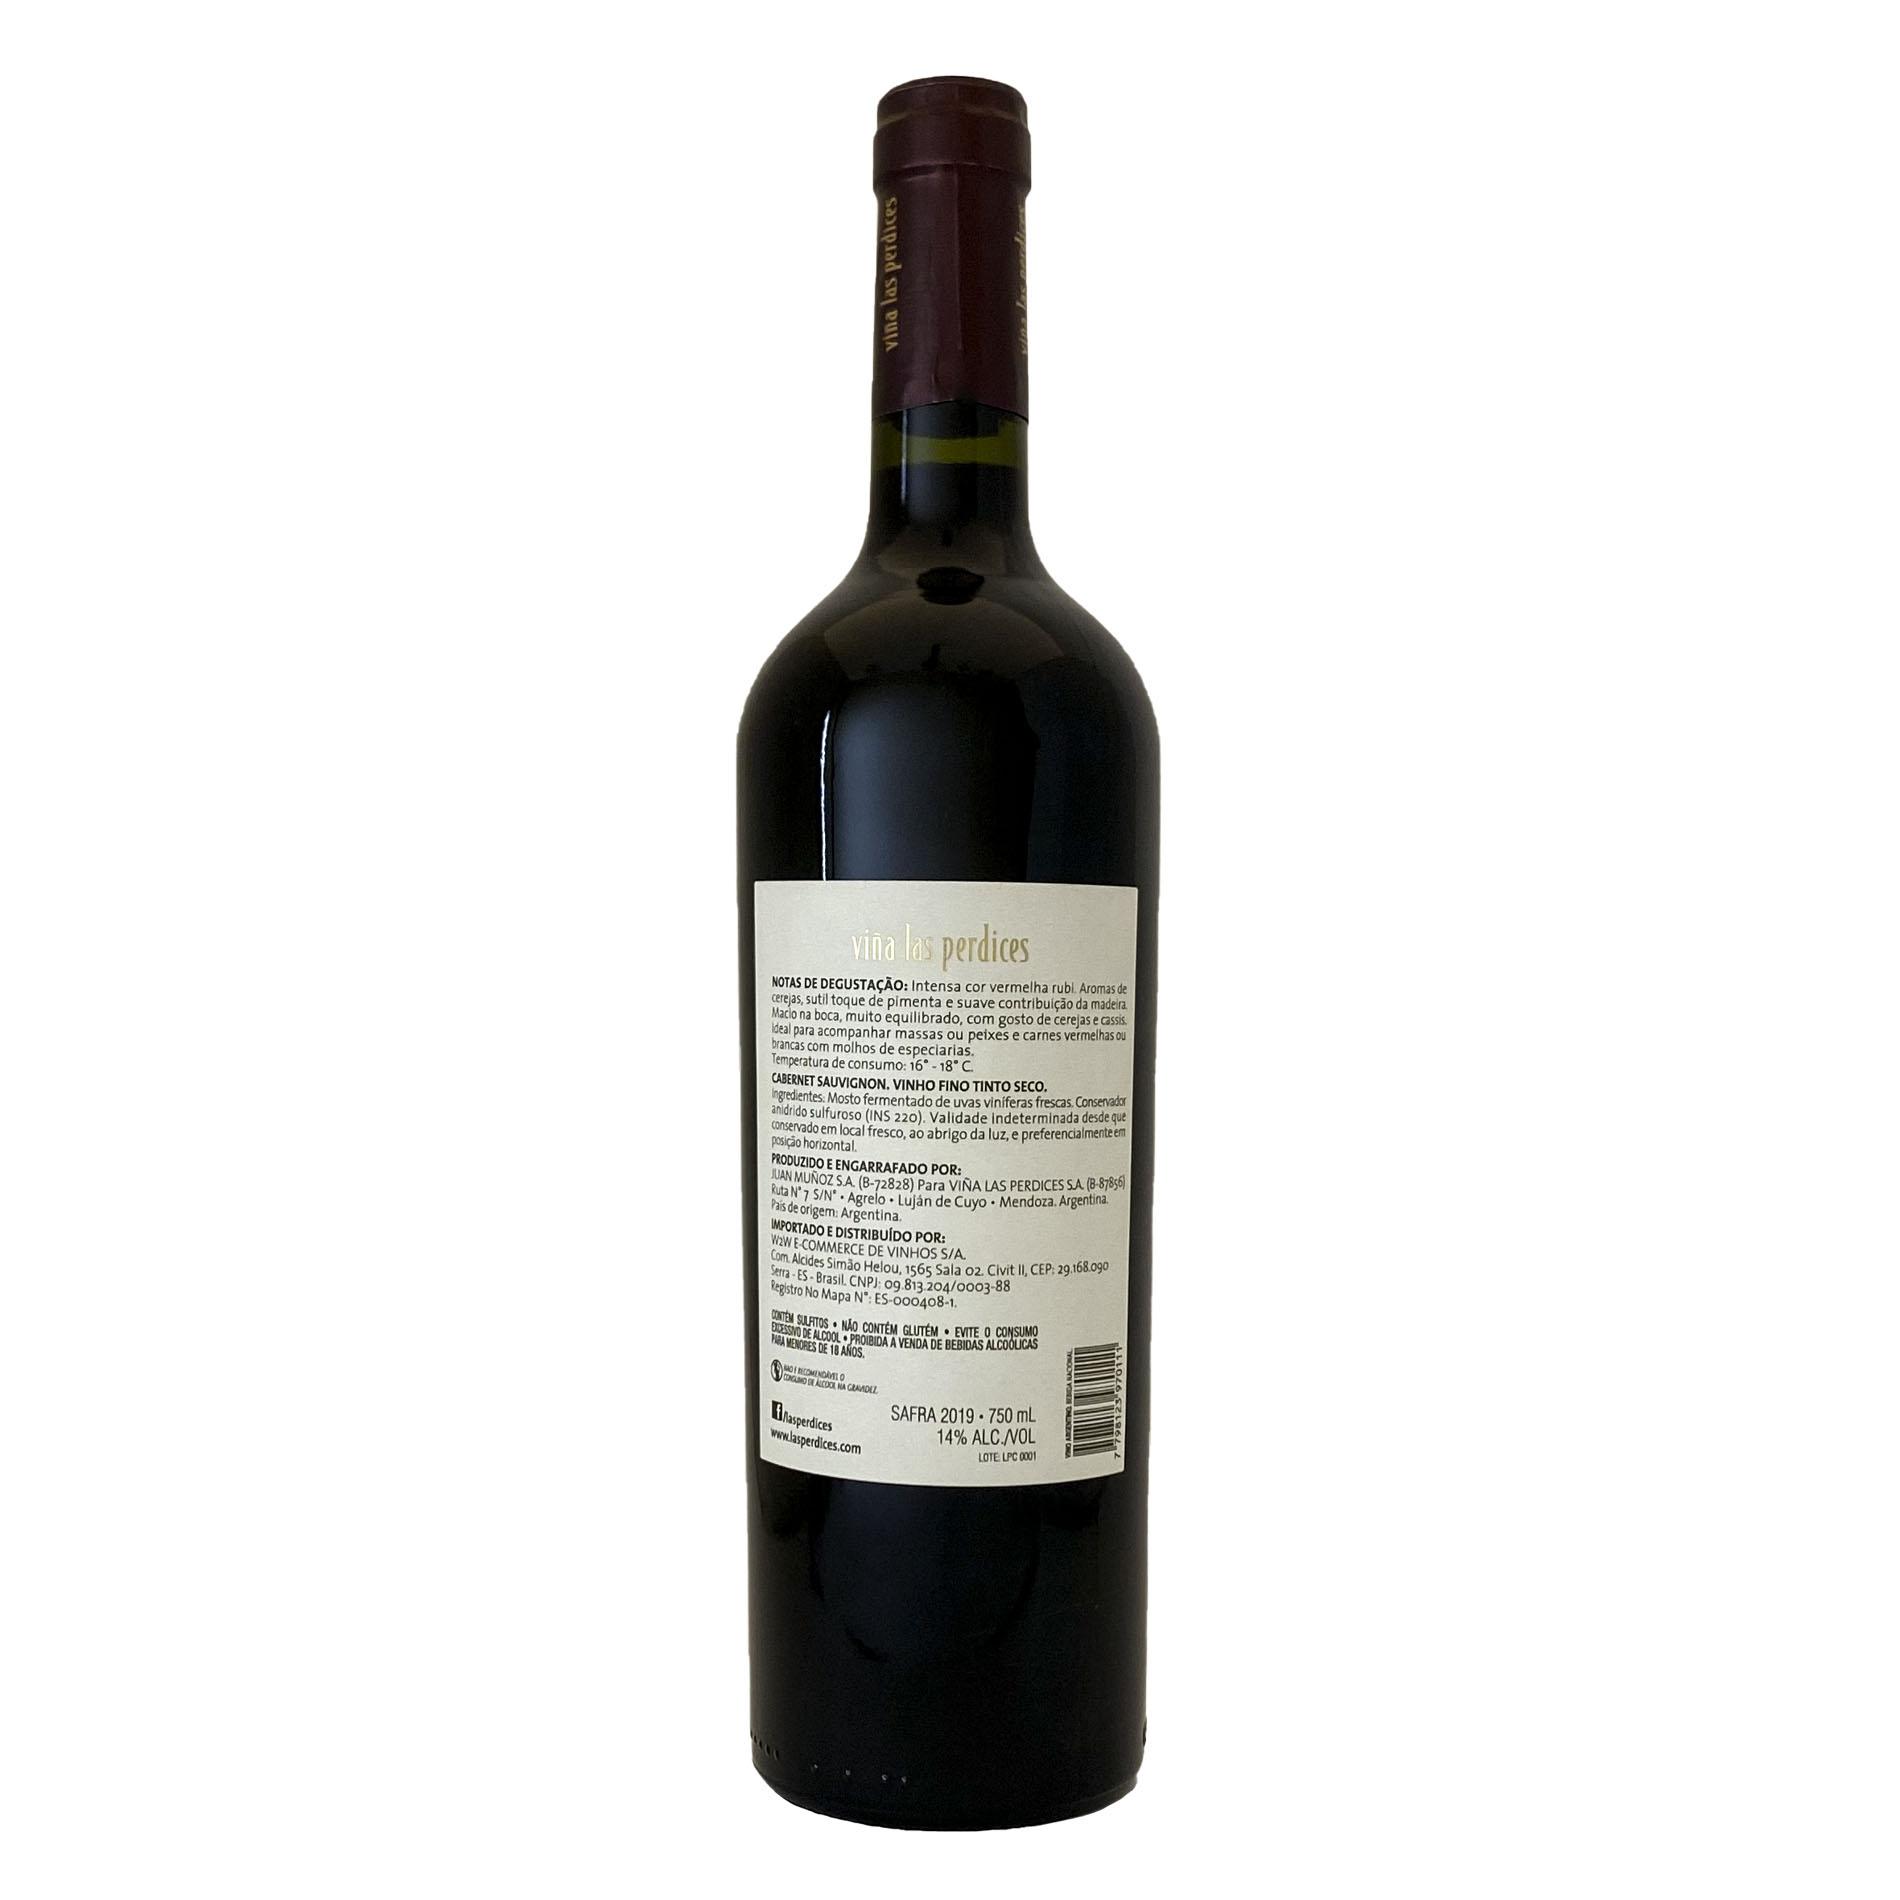 Las Perdices Cabernet Sauvignon  - Vinerize